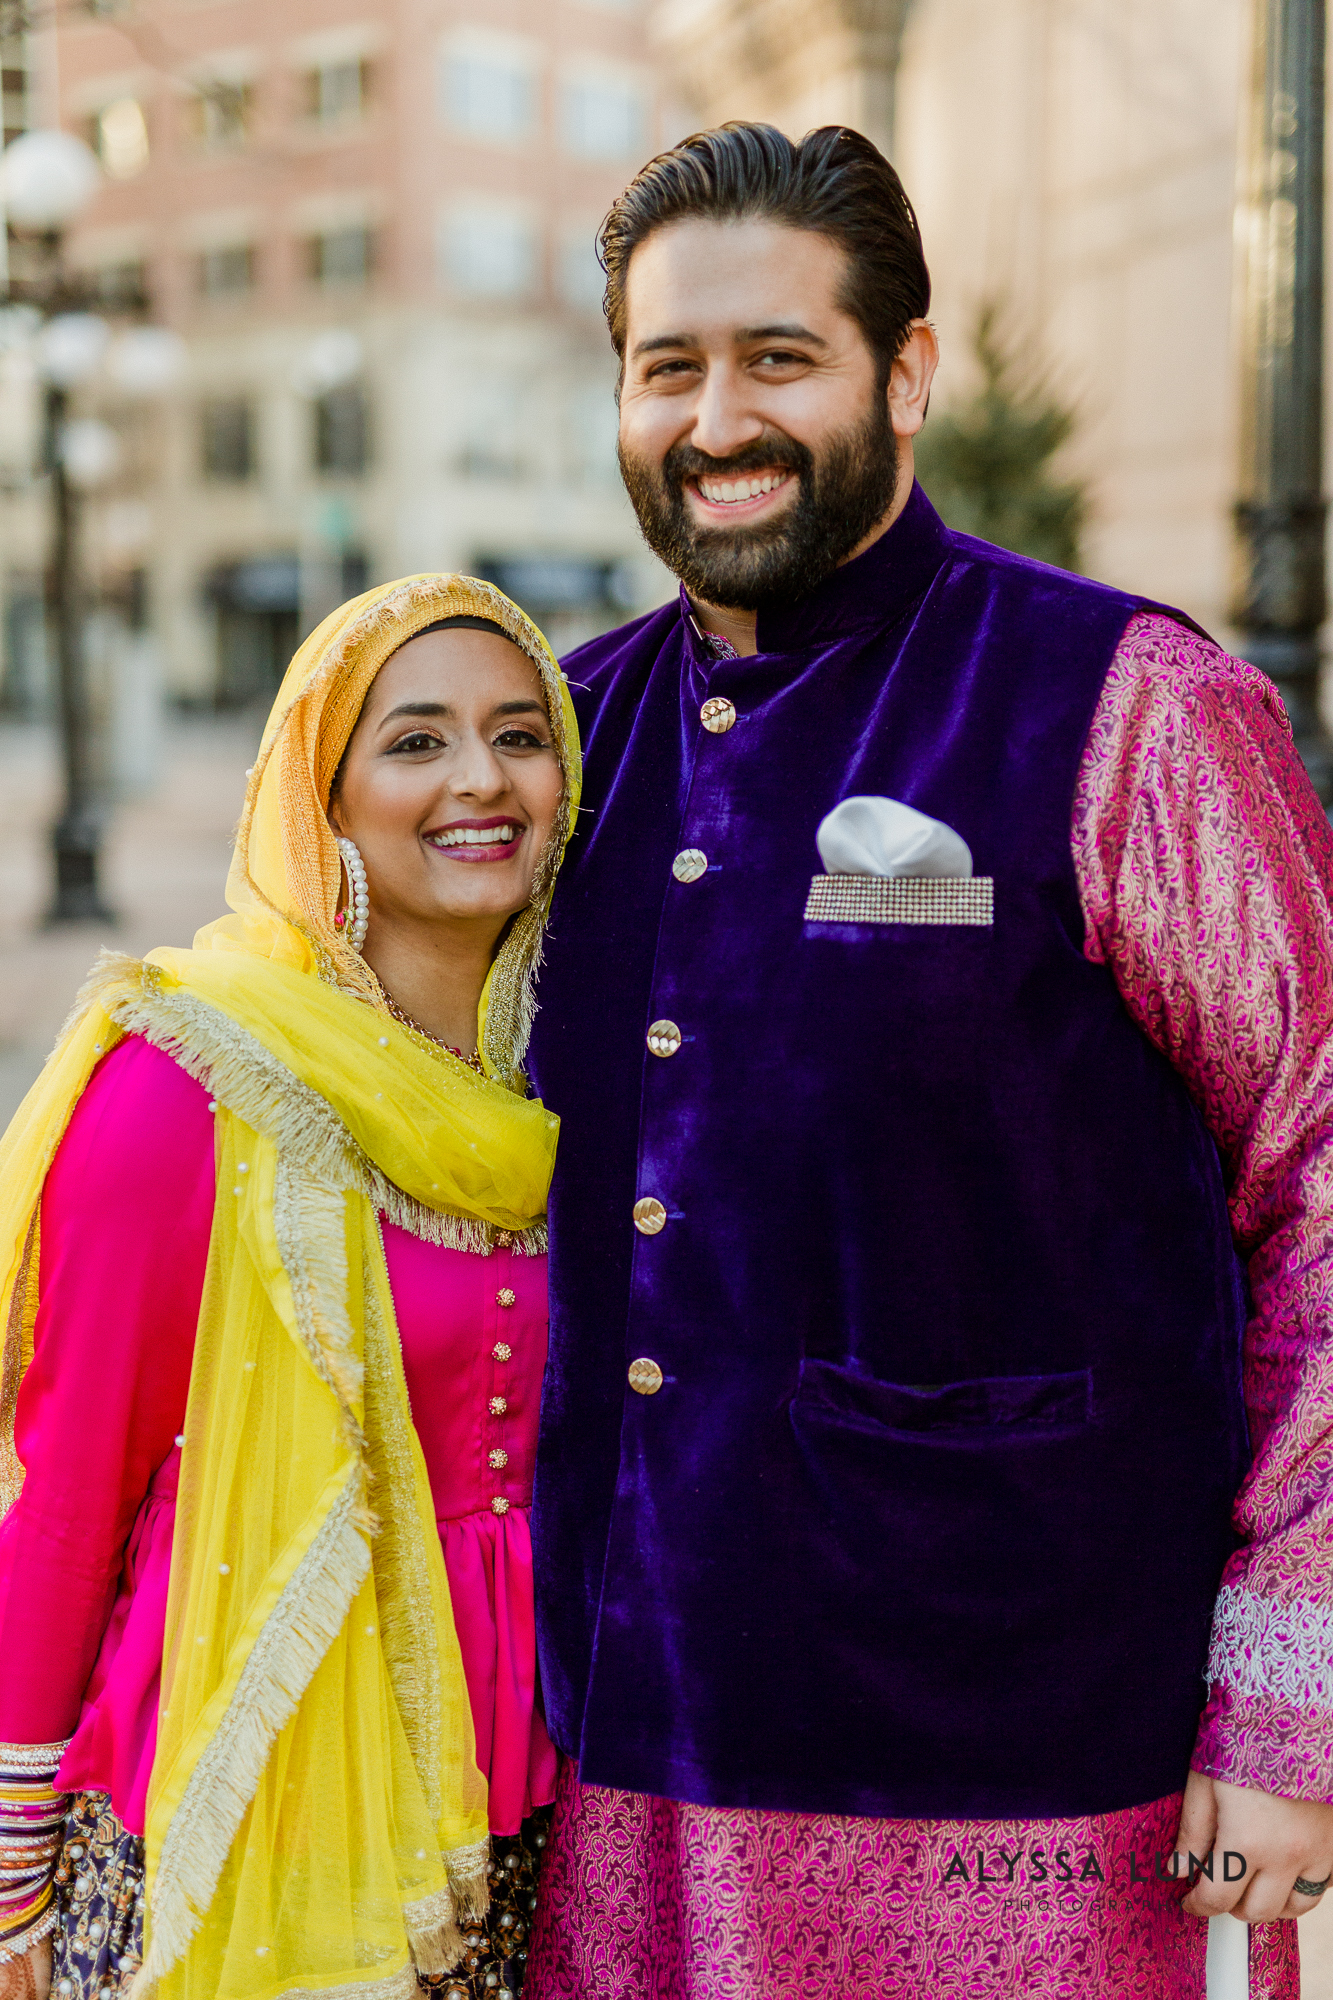 Modern muslim wedding photography Landmark Center-10.jpg